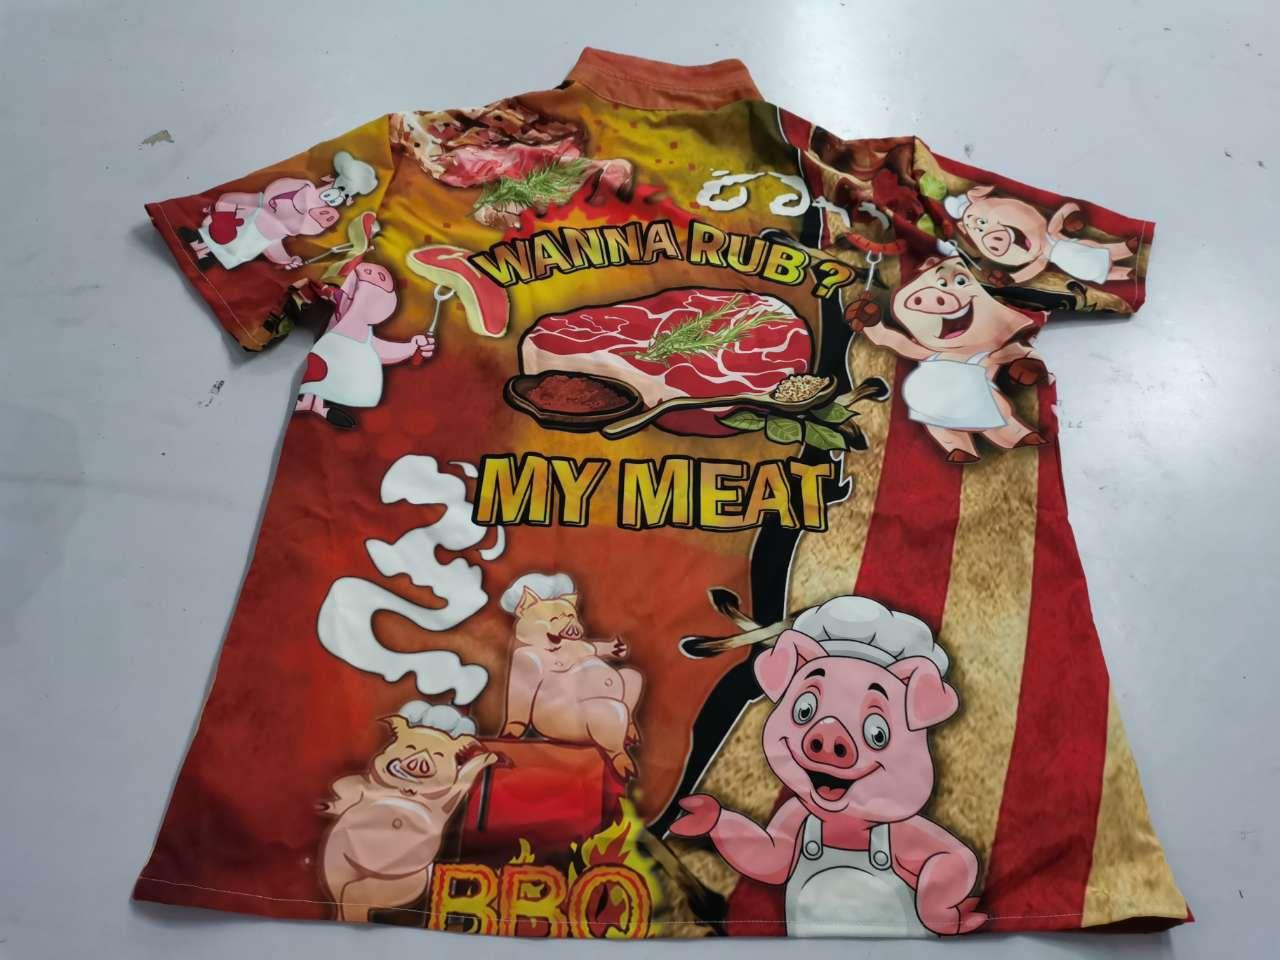 Wanna Rub My Meat Pork Pig Hawaiian shirt photo review